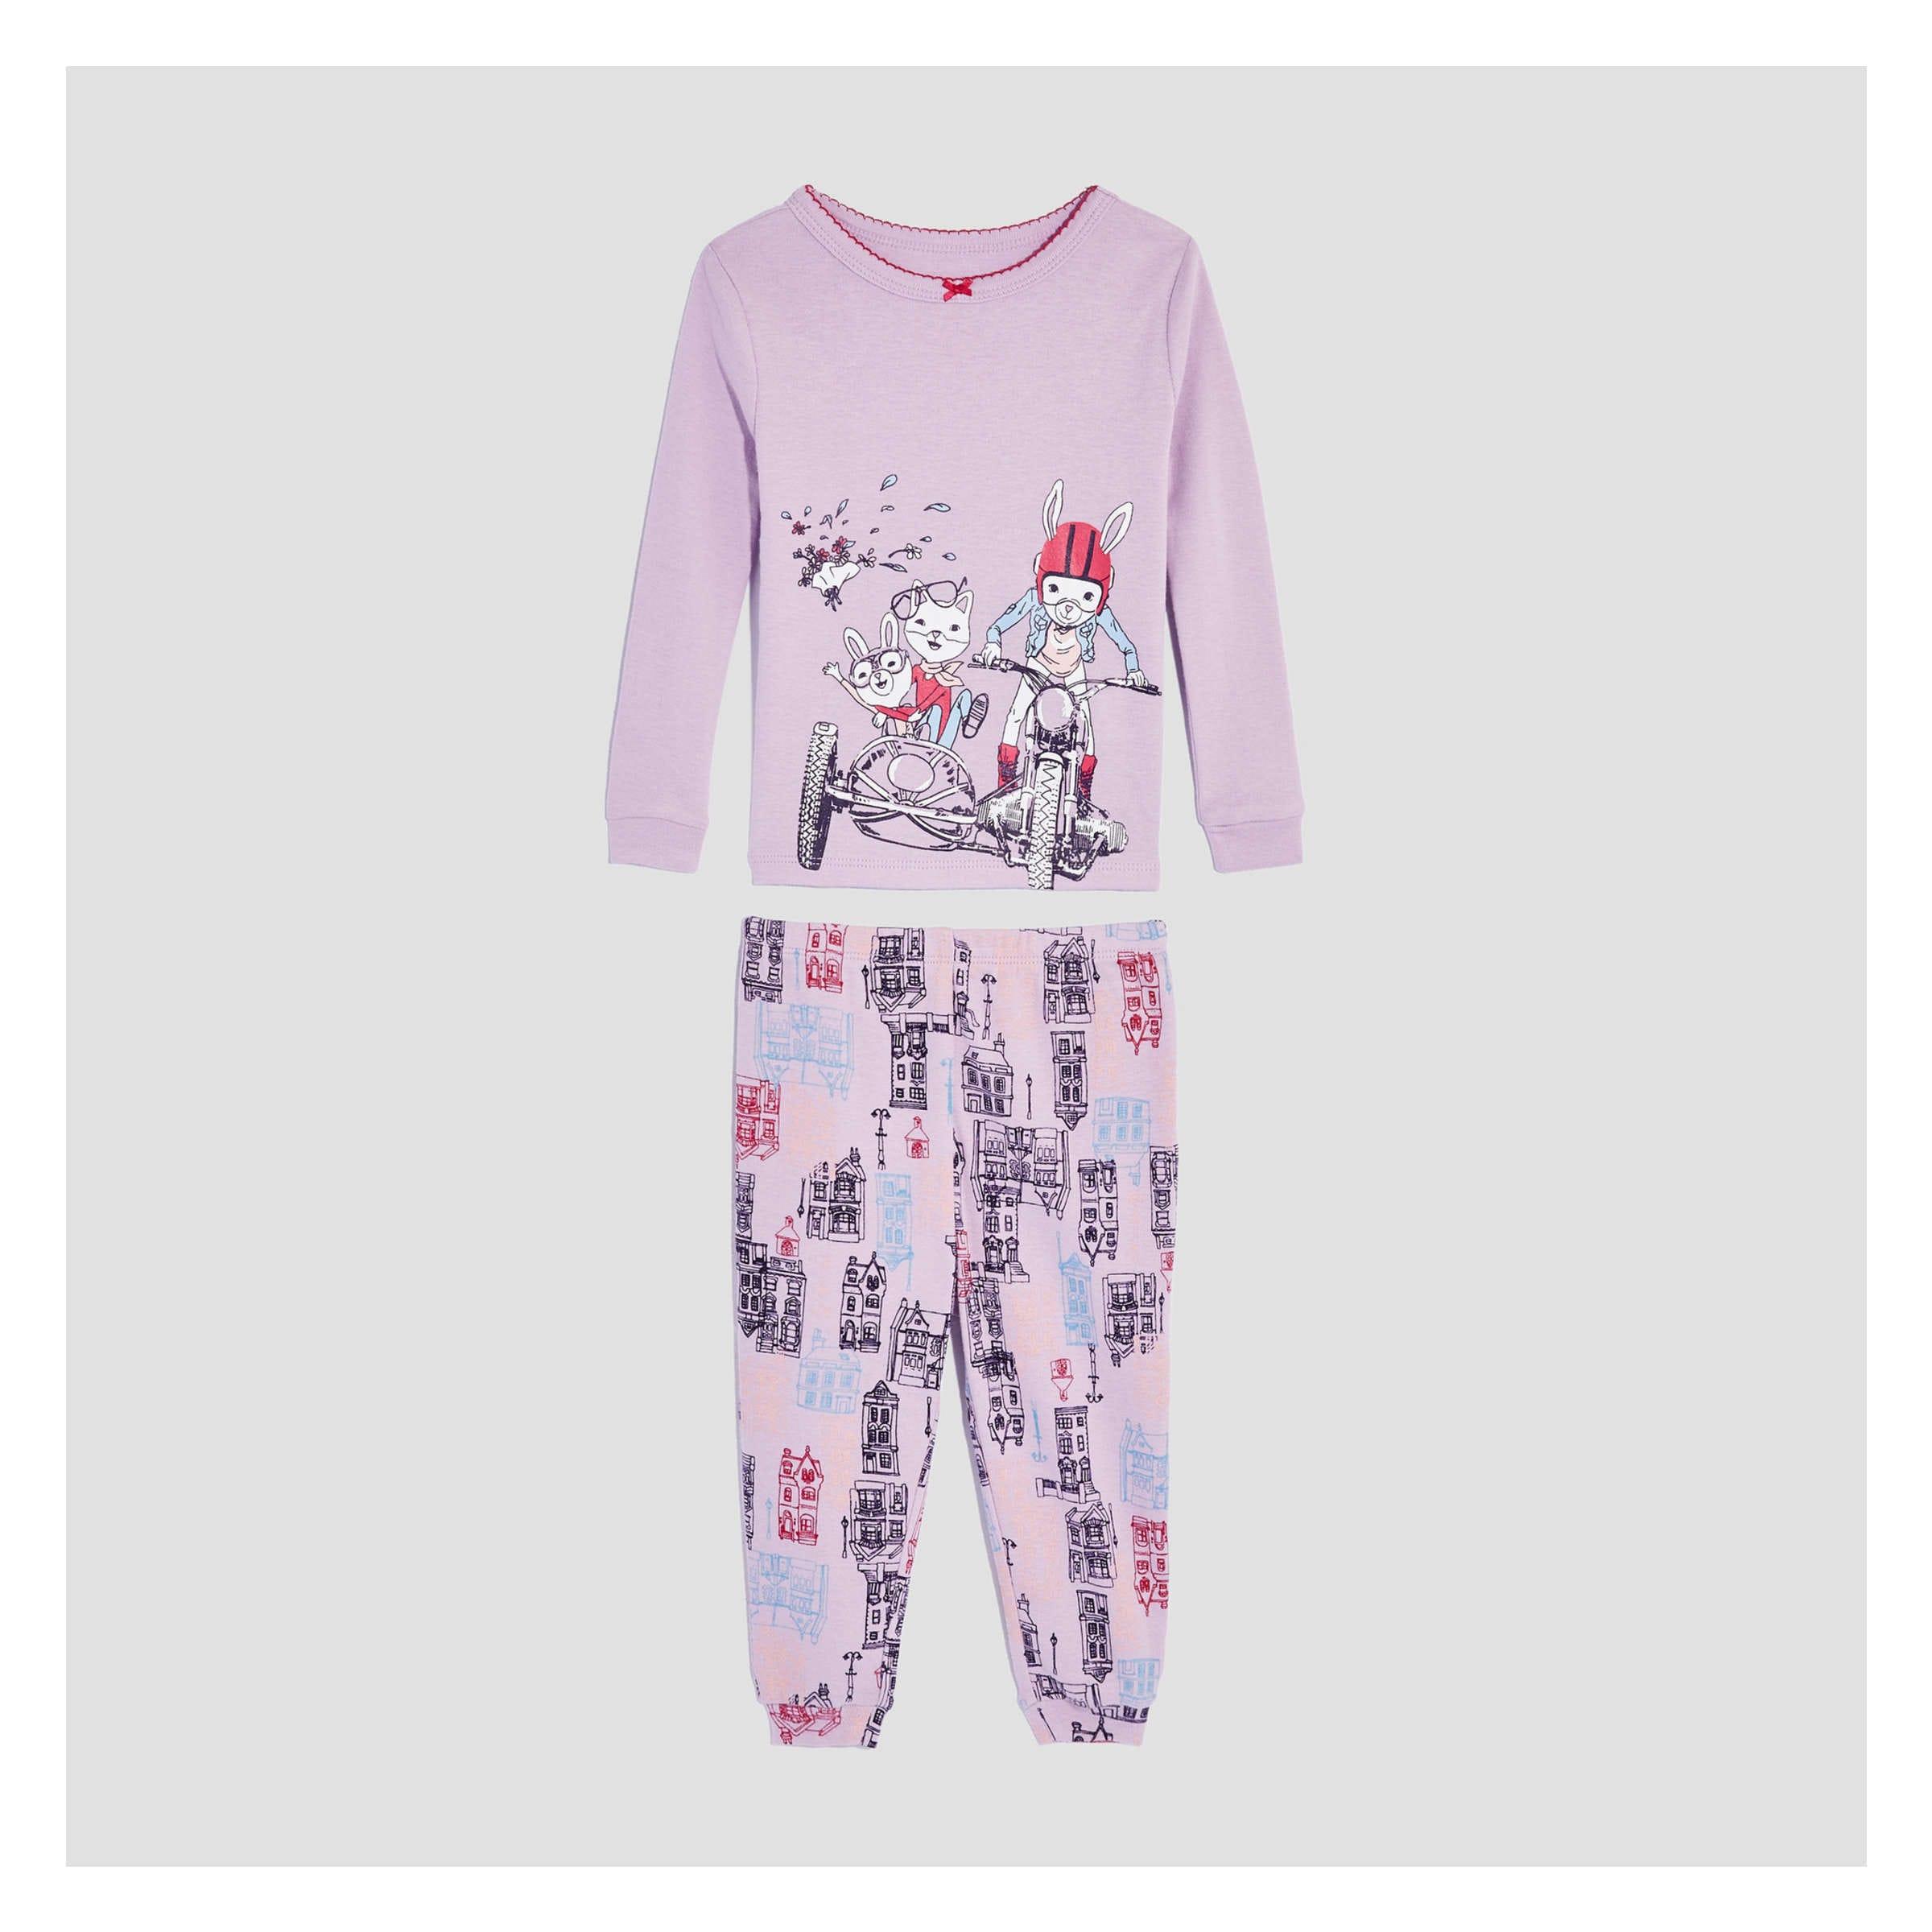 56eeccda2d18 Baby Girls  2 Piece Pajama Set in Pale Purple from Joe Fresh